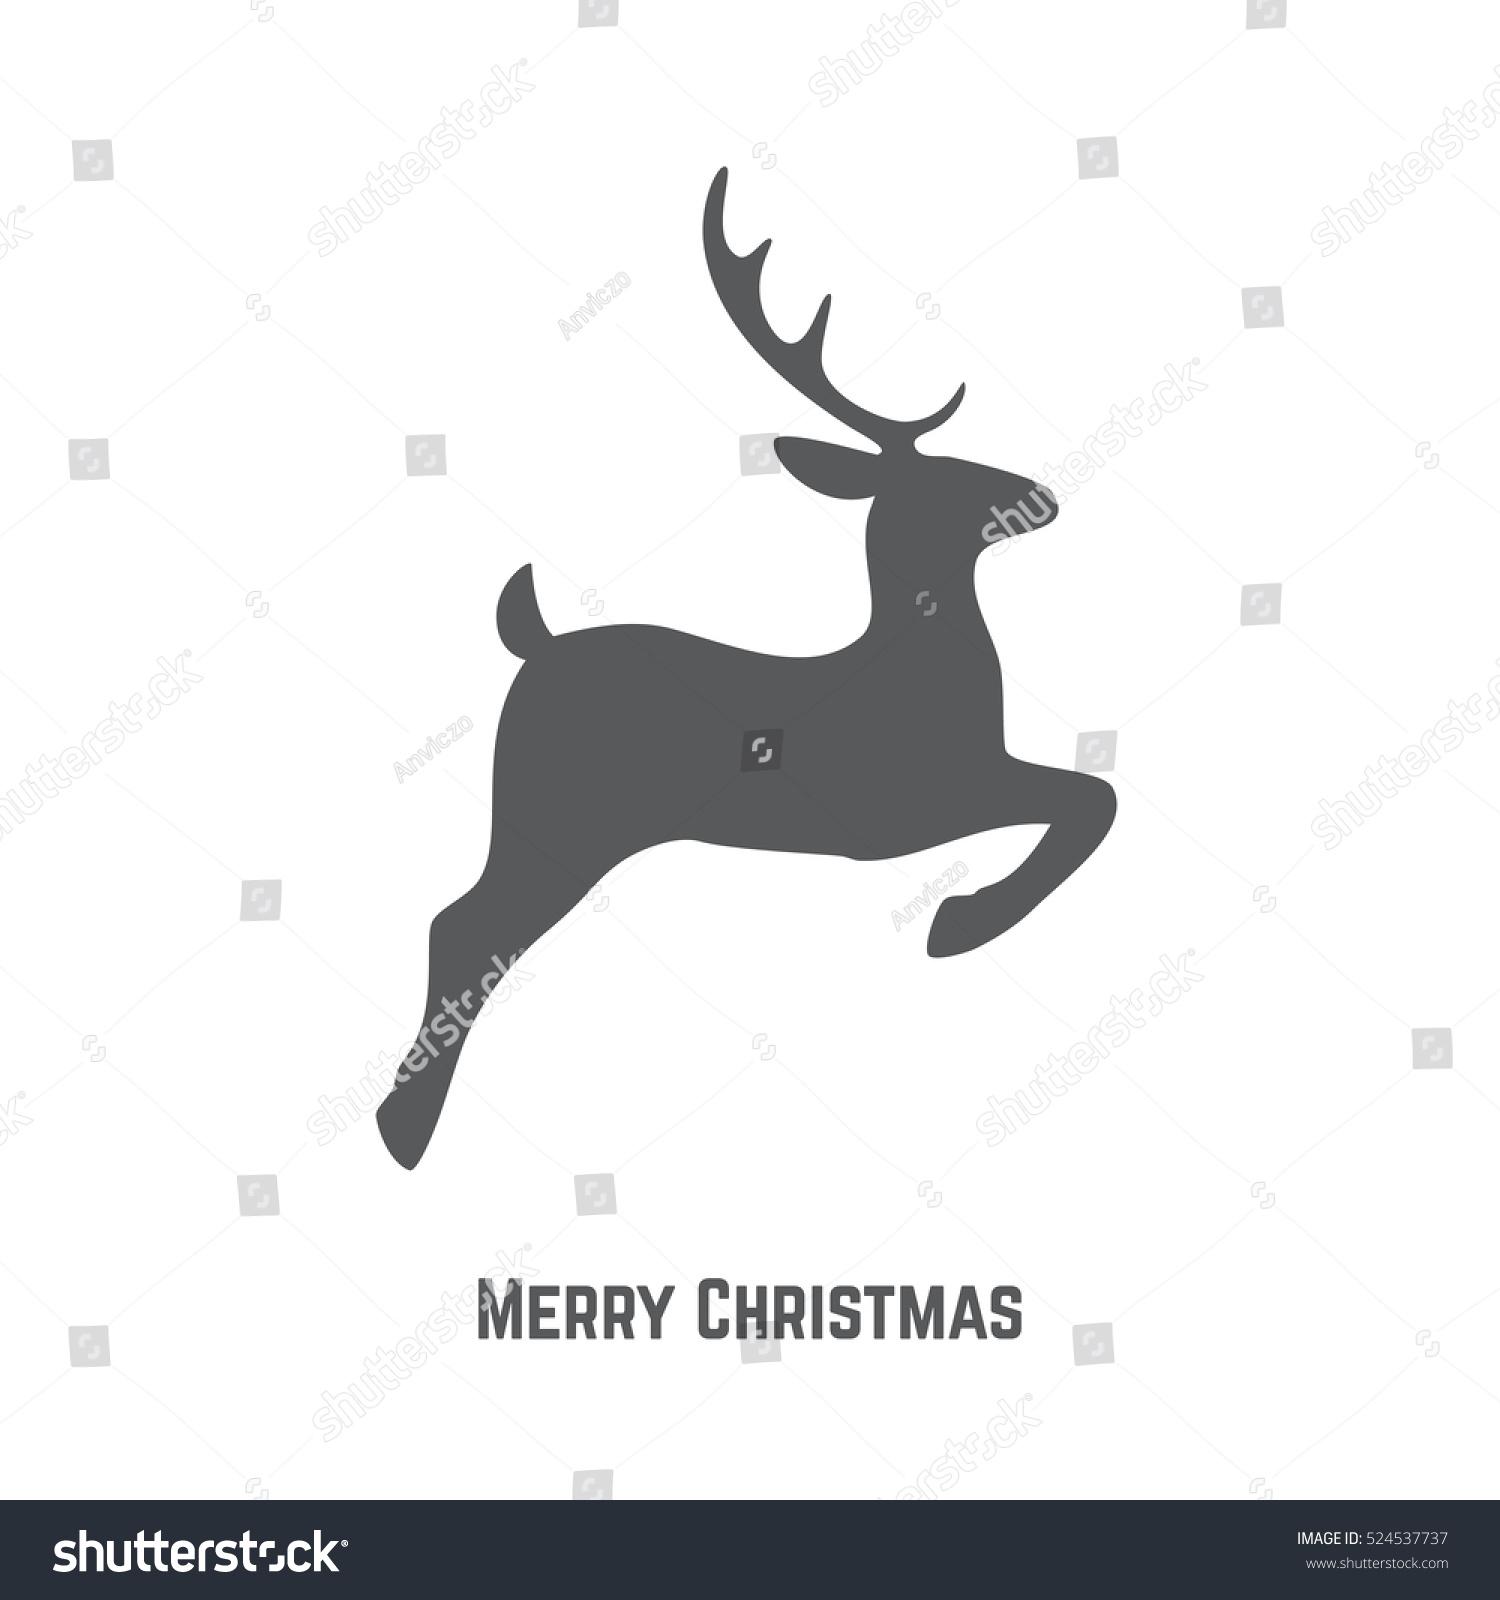 Christmas Reindeer Silhouette Christmas Greeting Card Stock ...